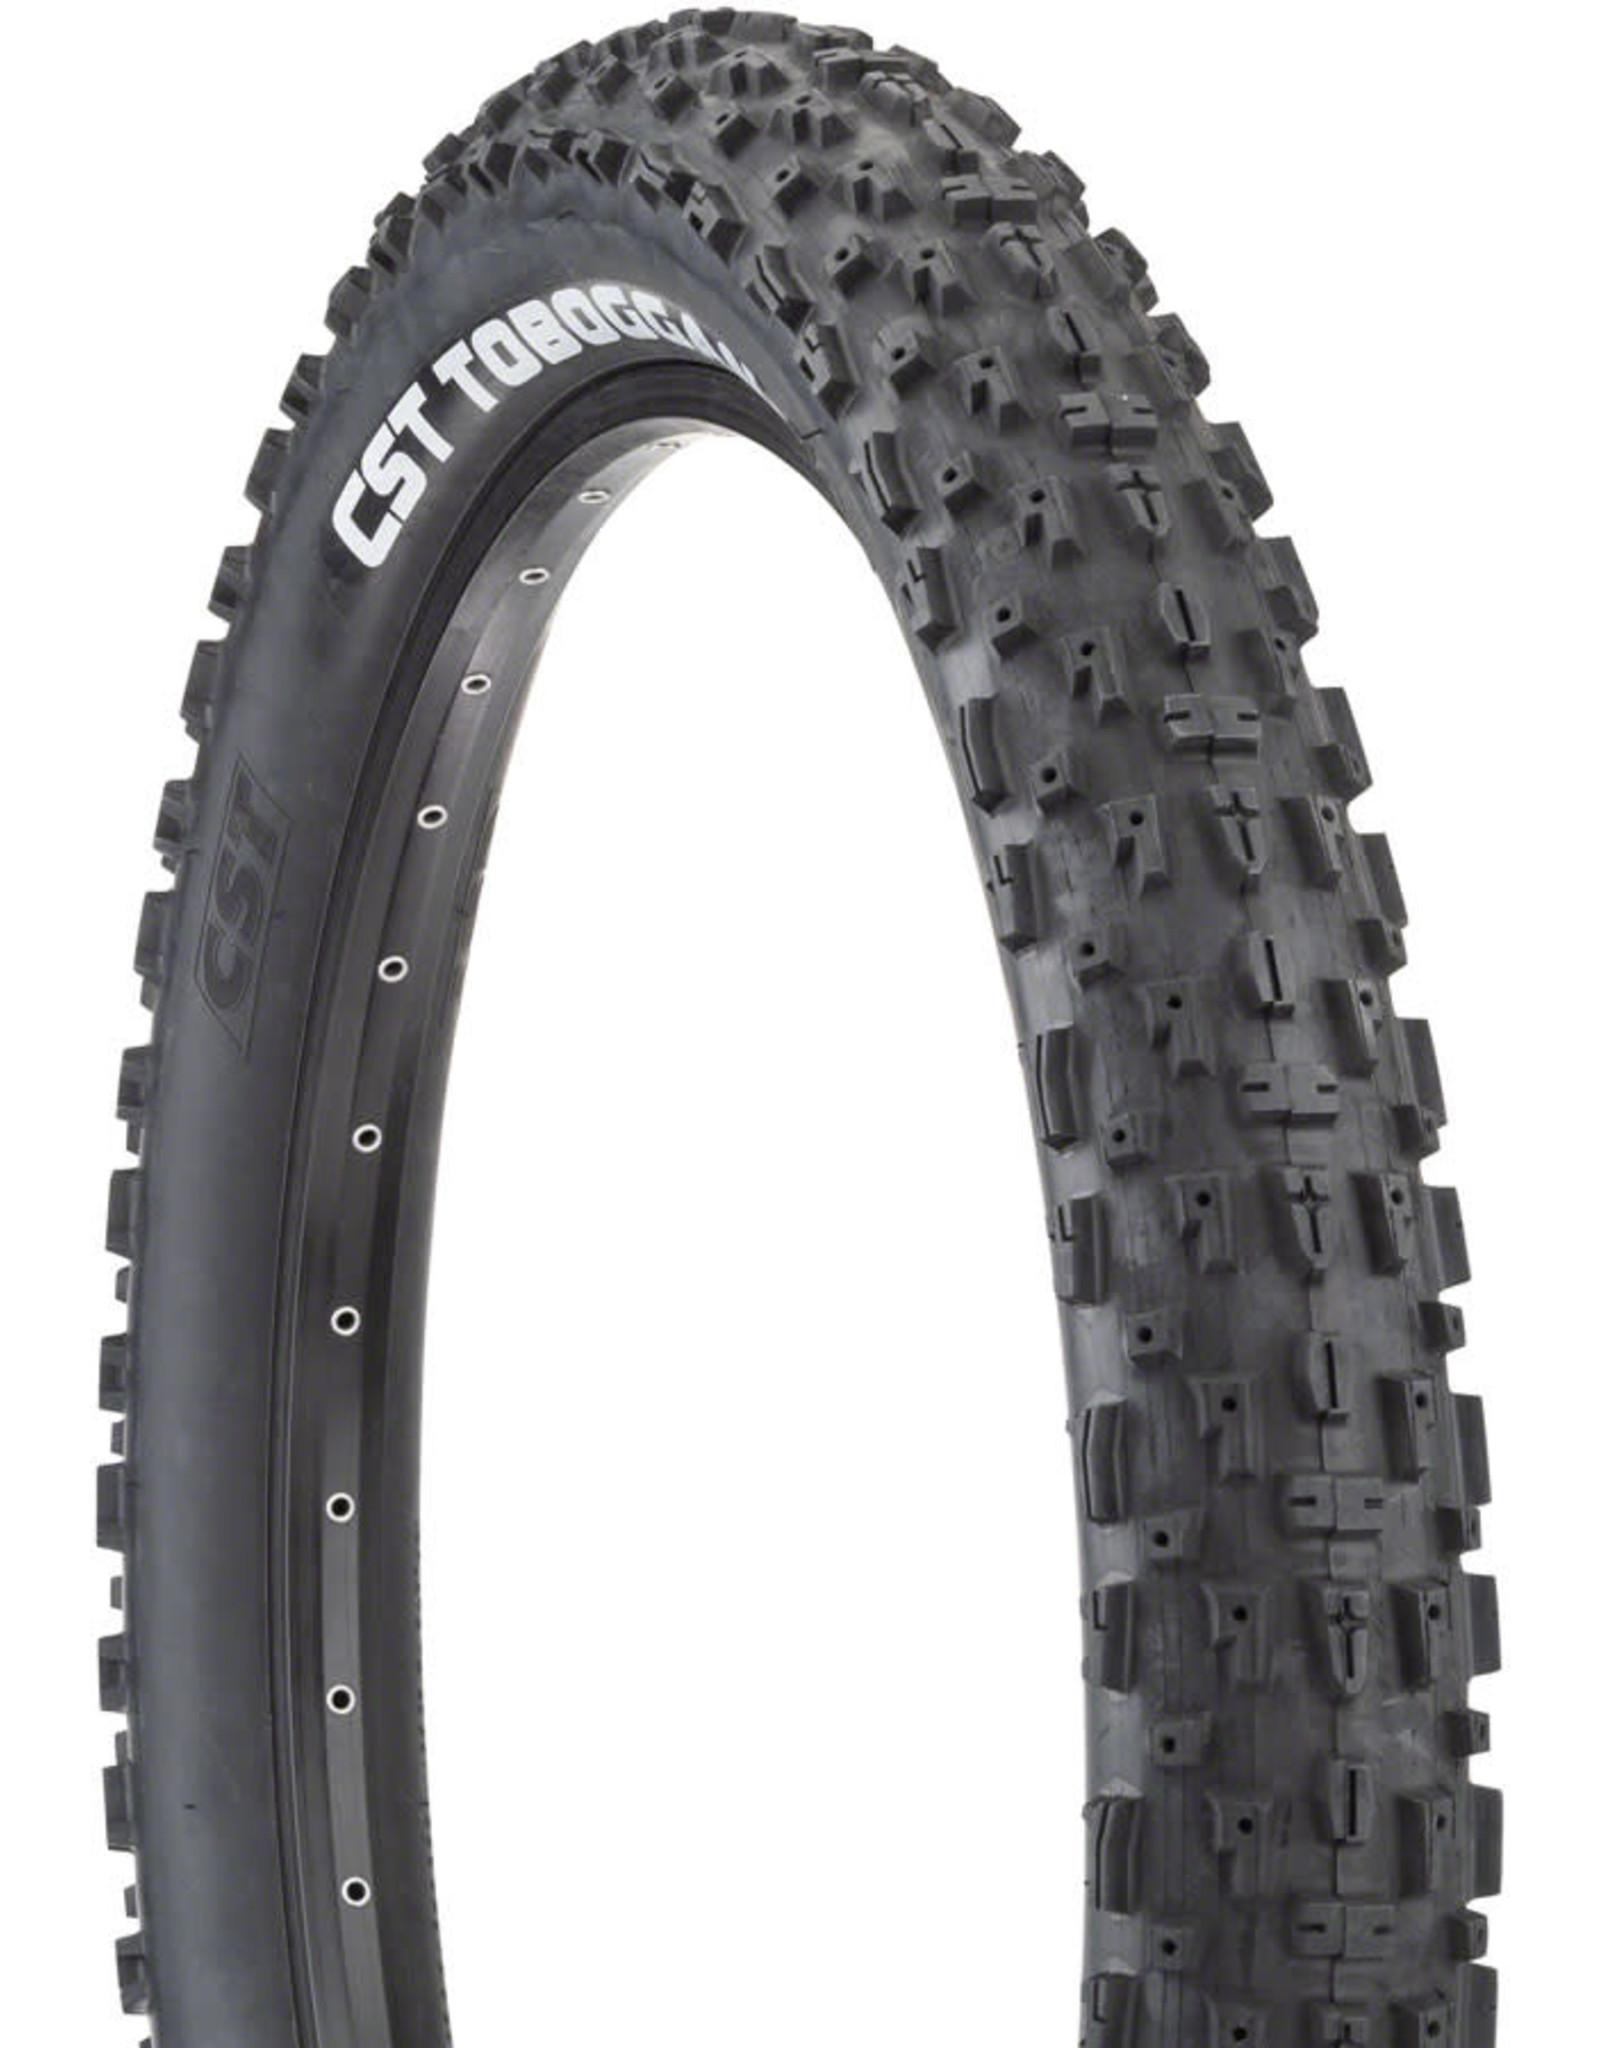 CST CST Toboggan Tire - 26 x 4, Clincher, Wire, Black